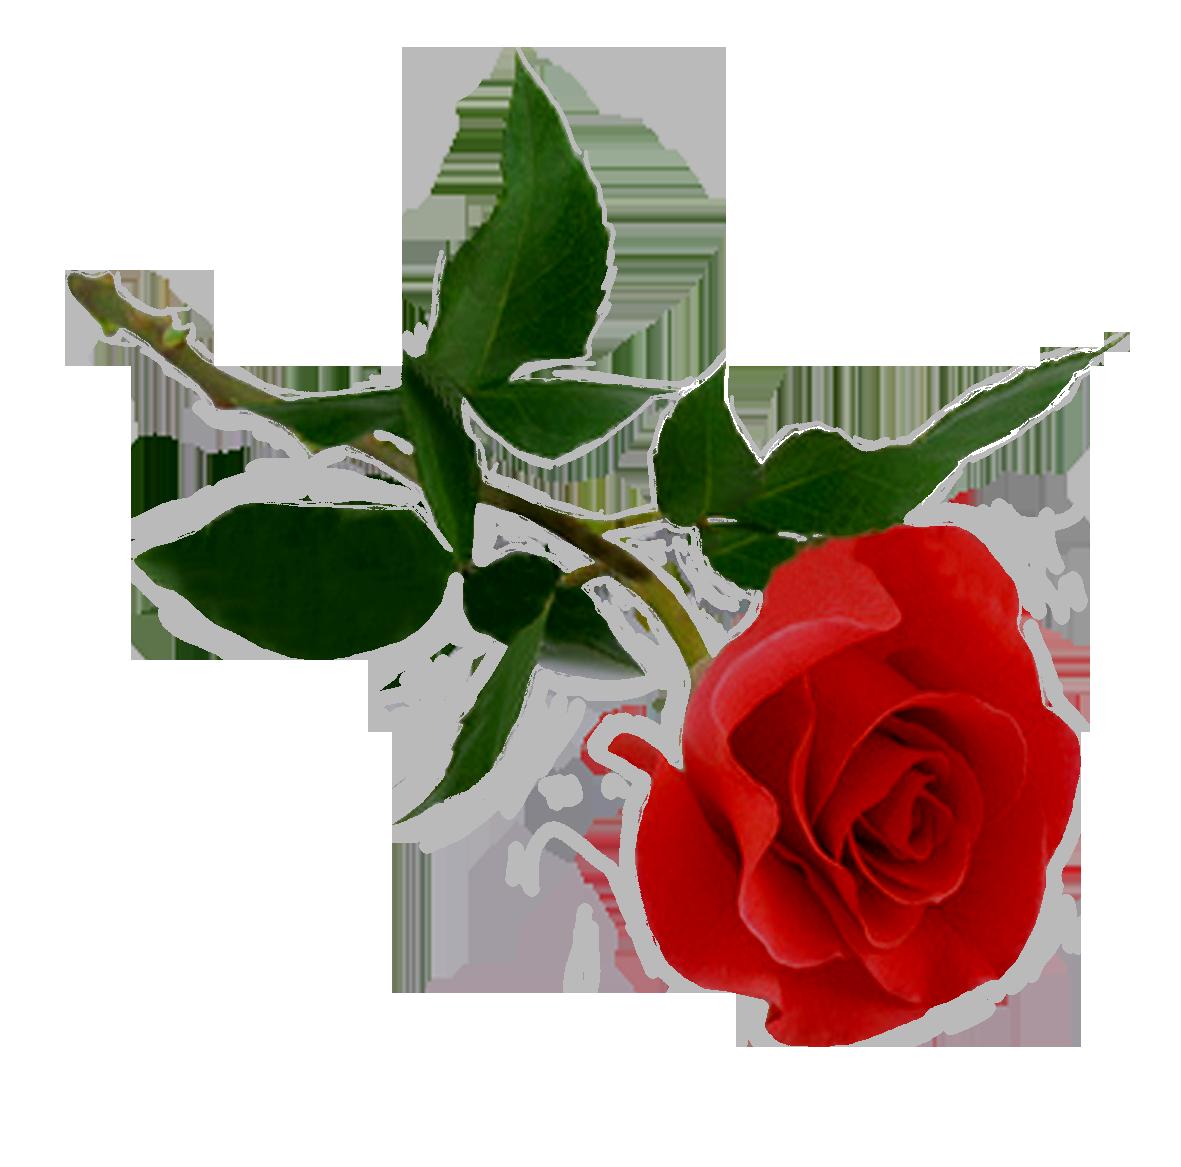 Download Rose Png Hd HQ PNG Image | FreePNGImg